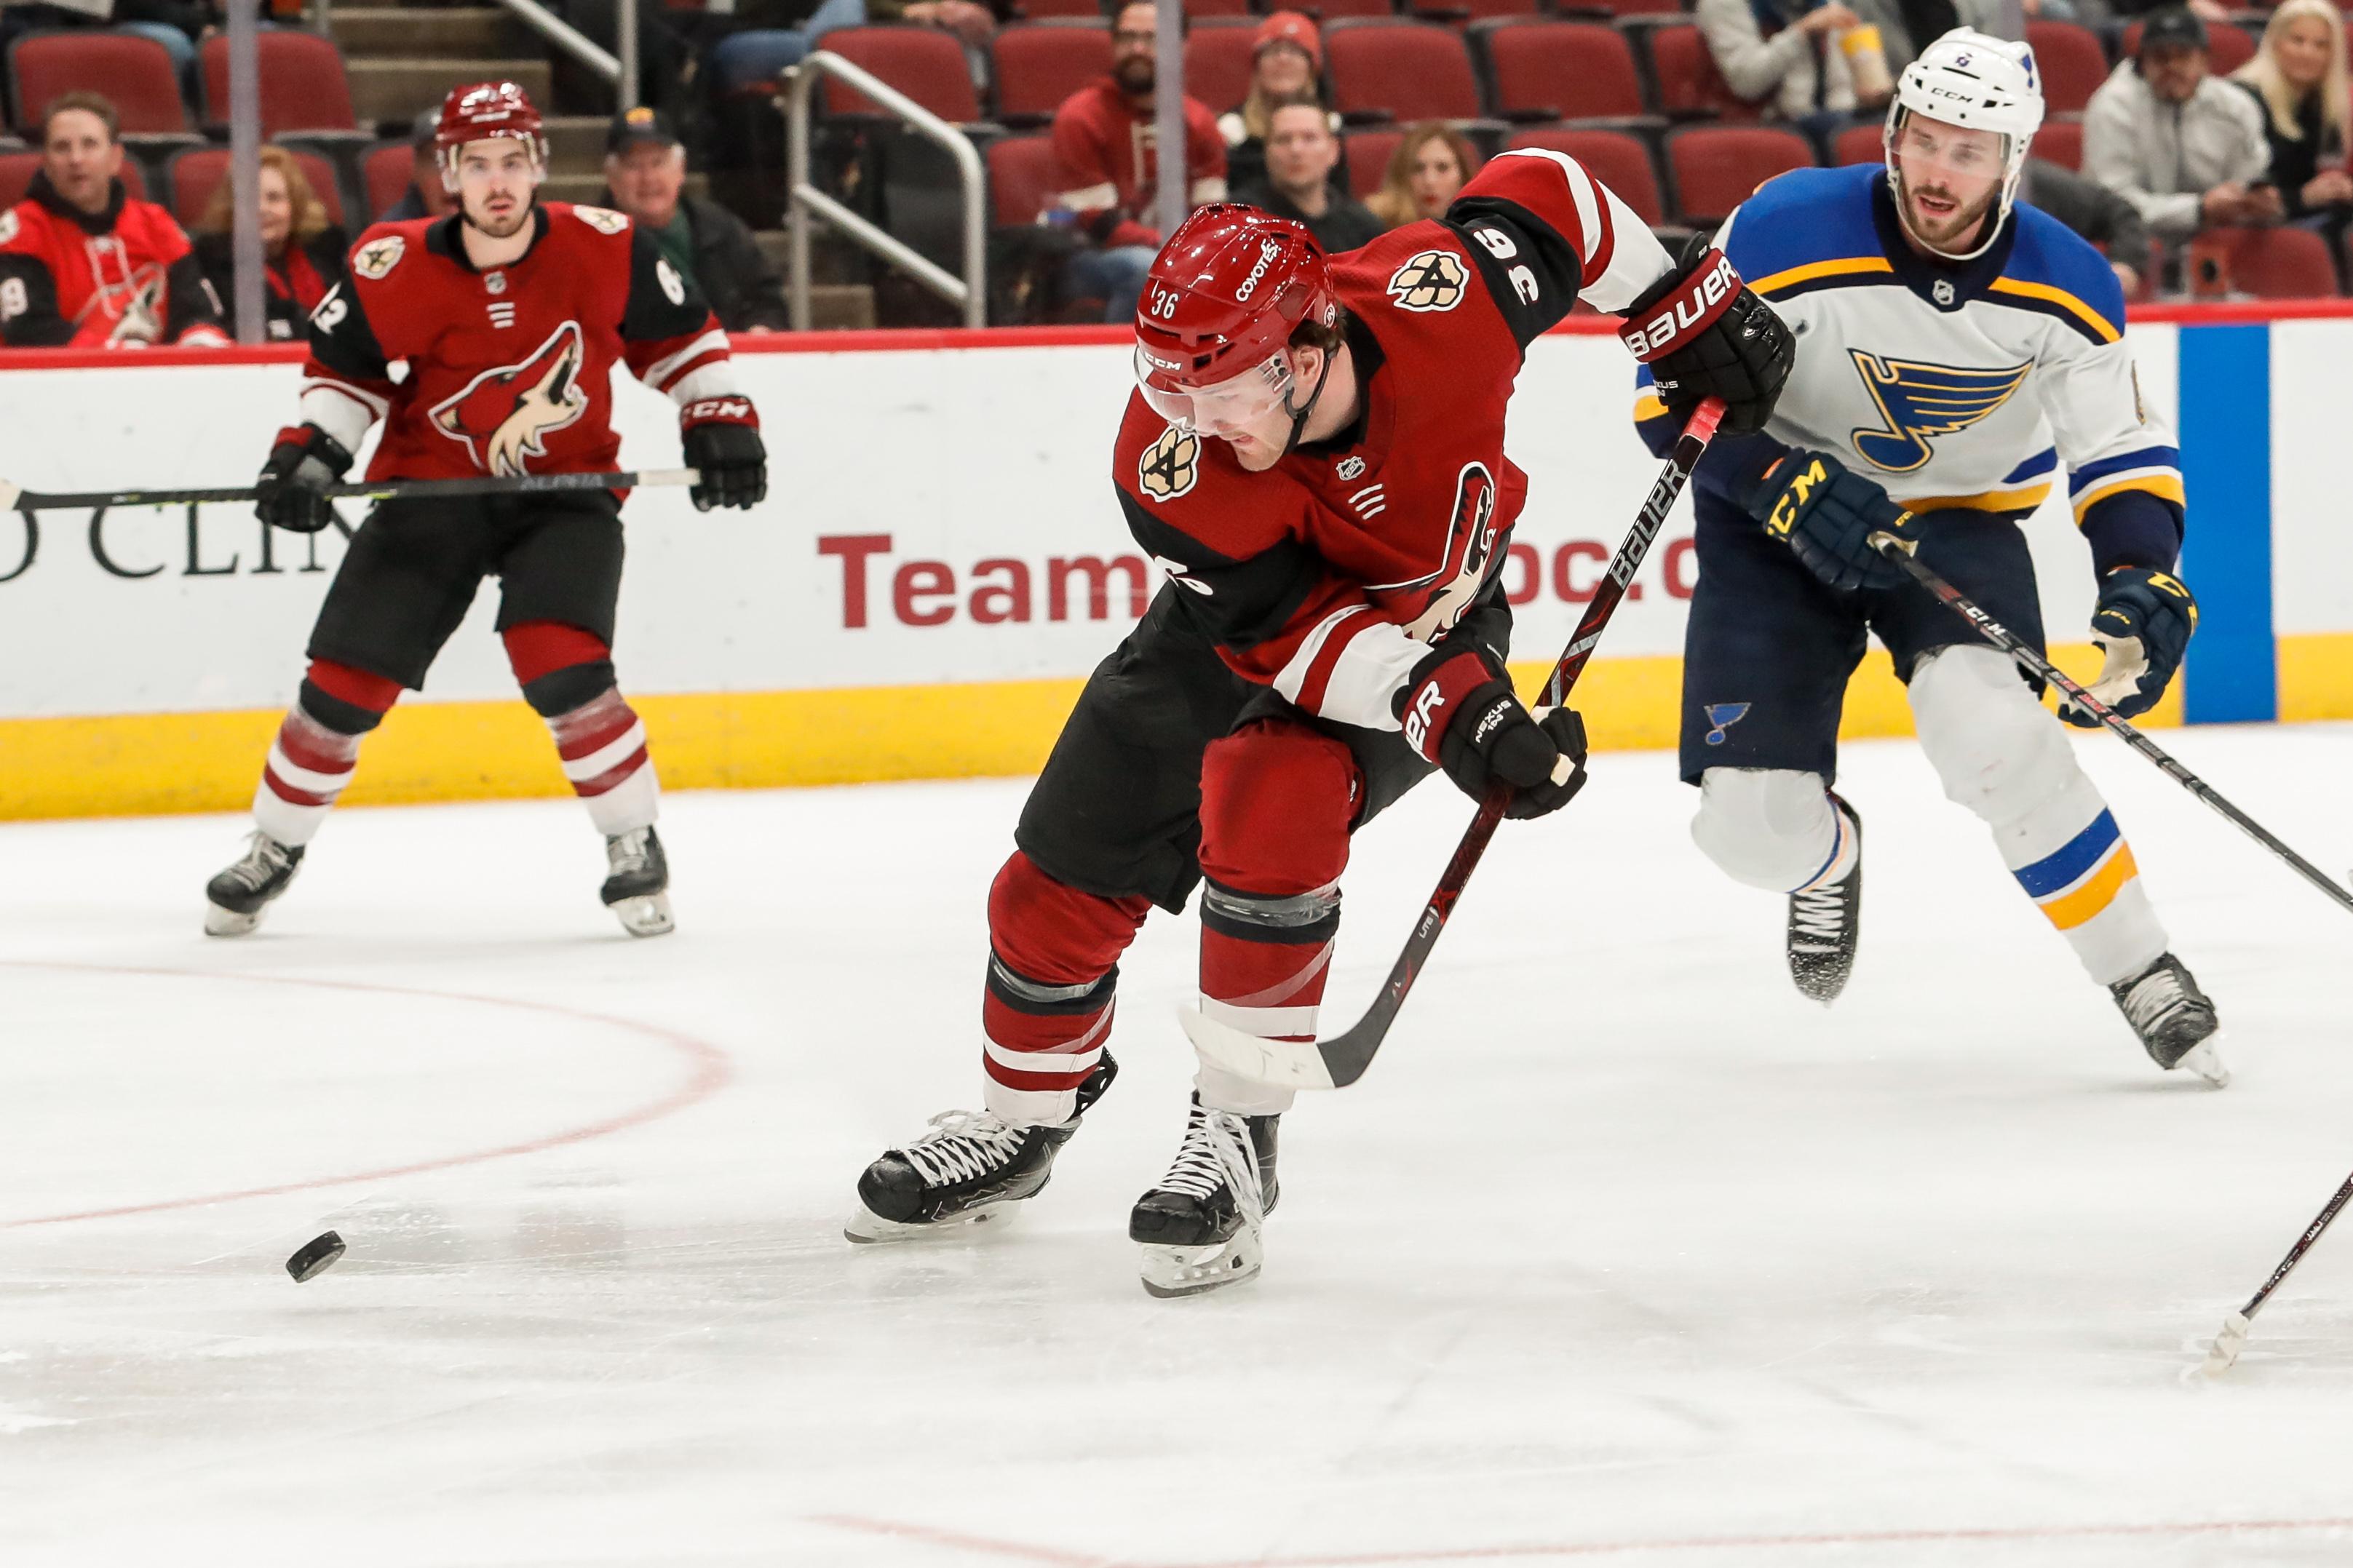 NHL: FEB 14 Blues at Coyotes